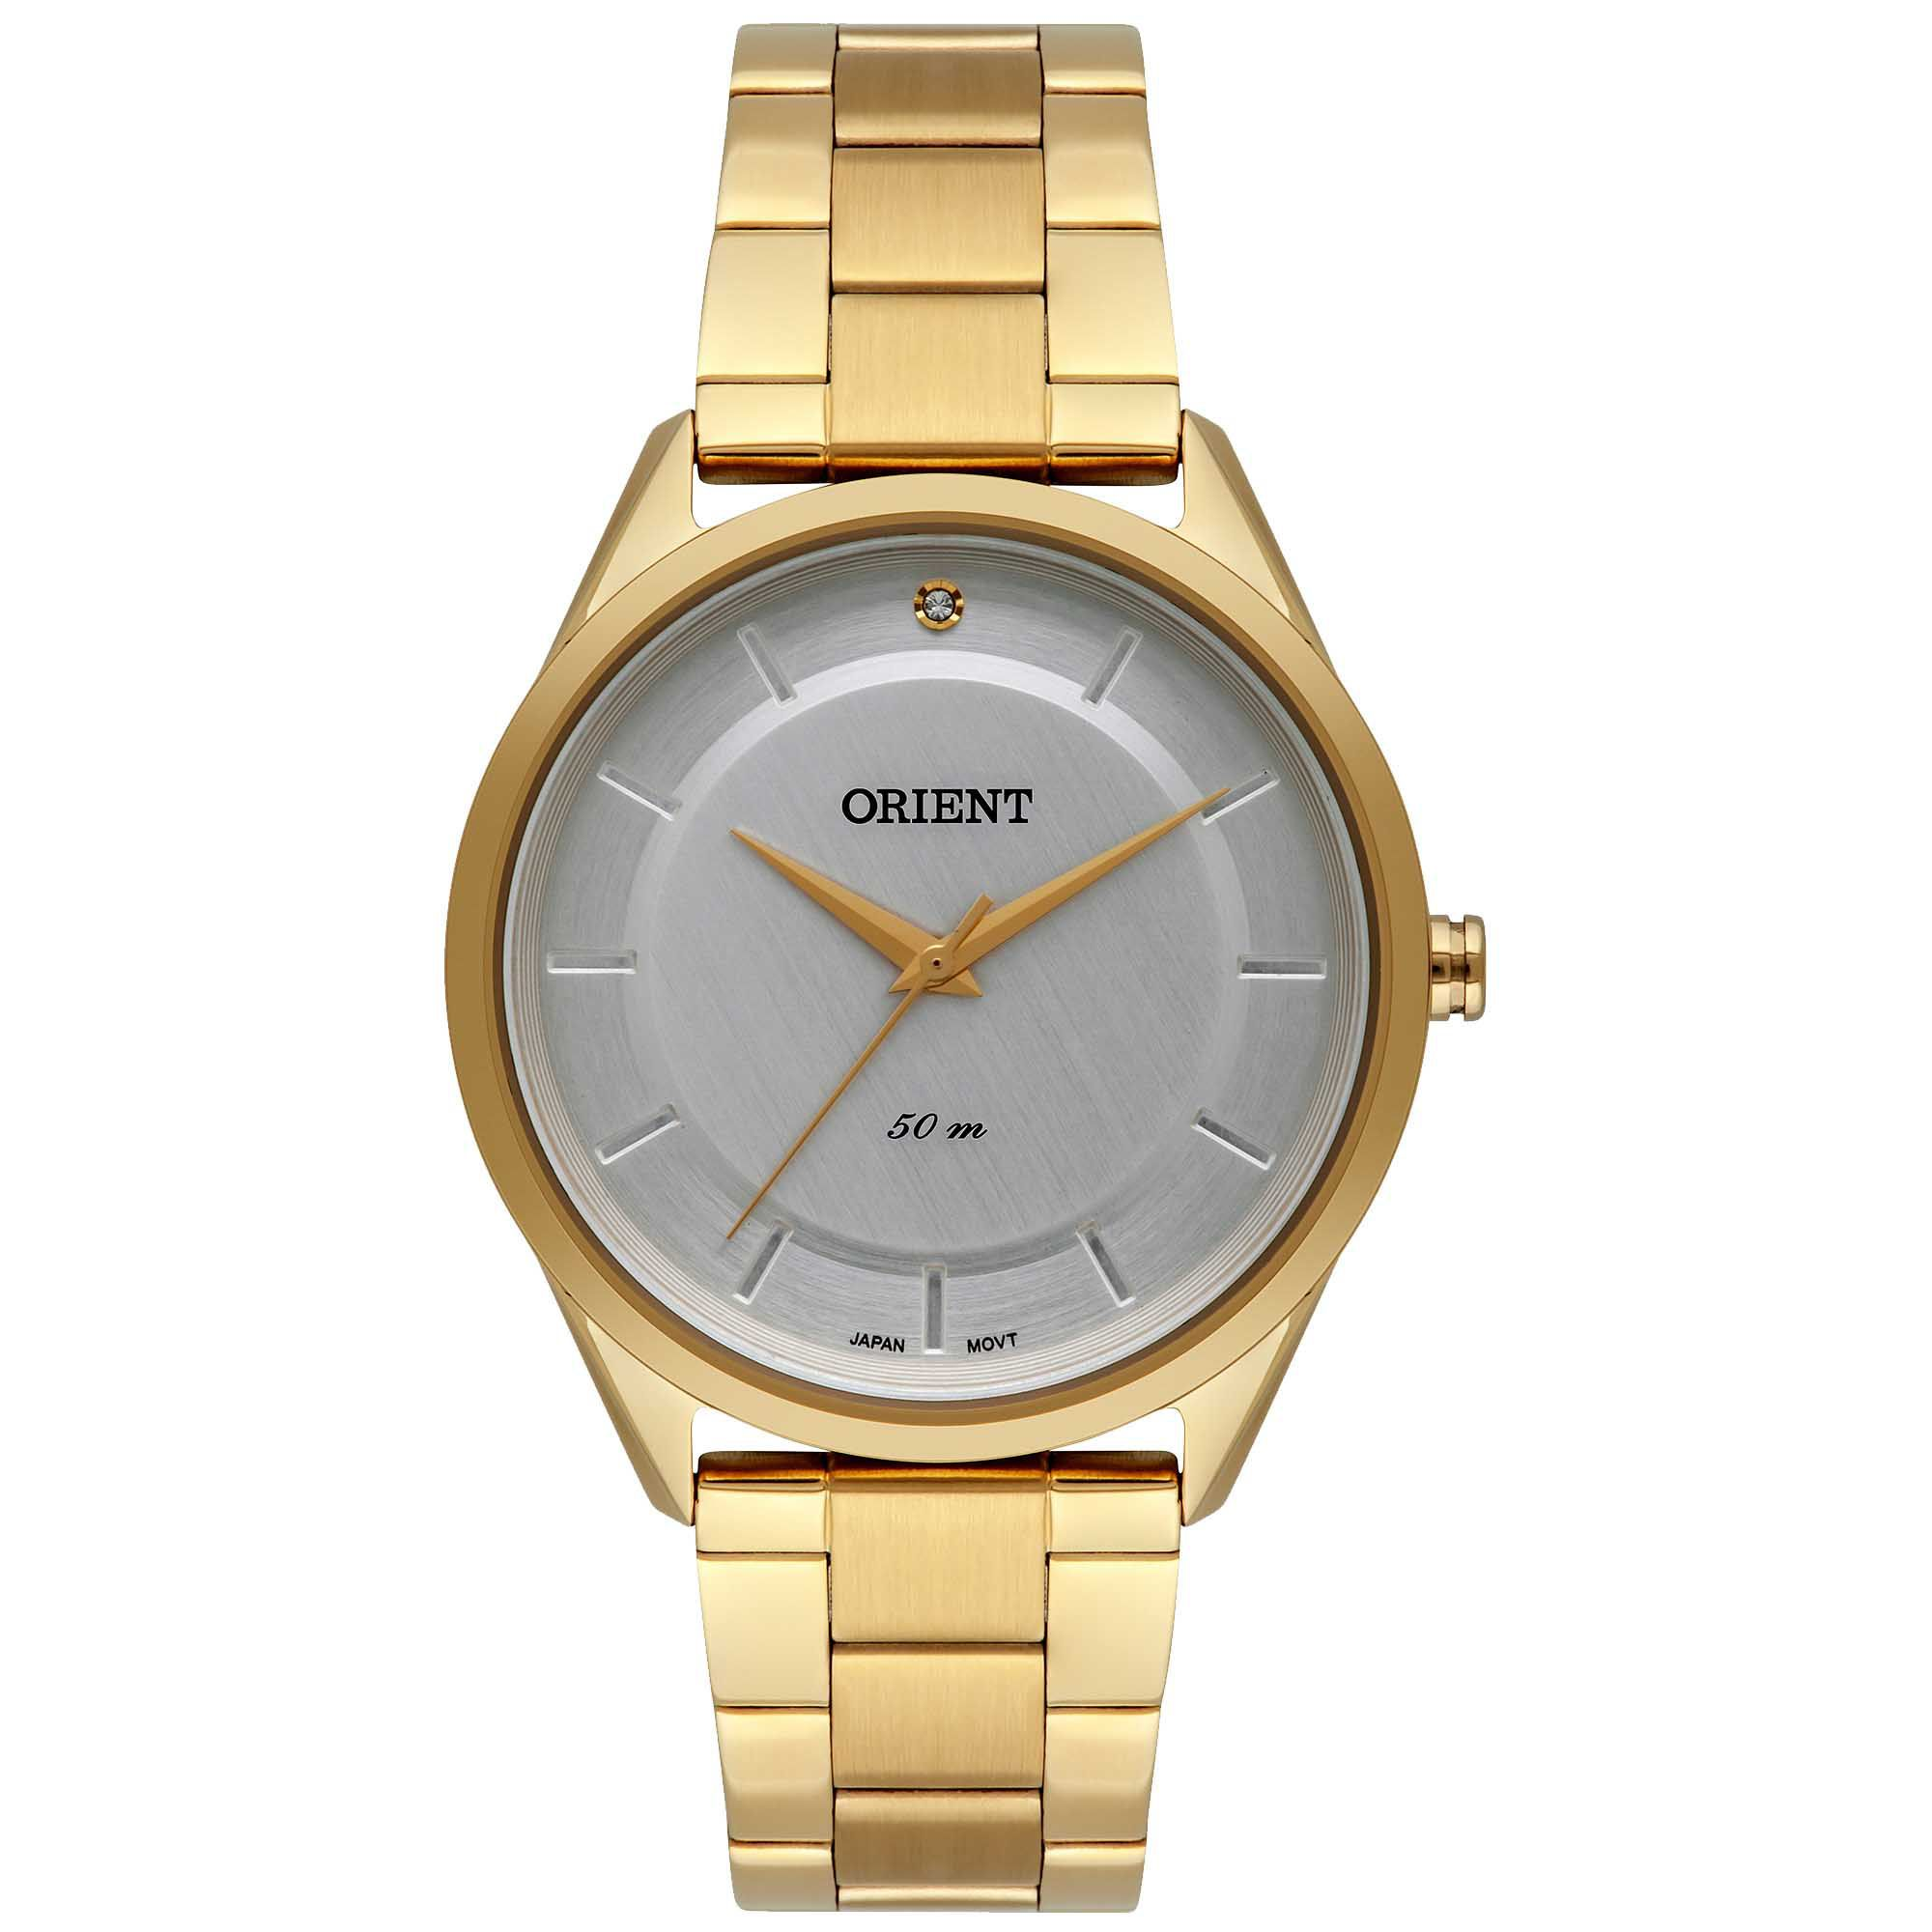 Relógio Feminino Orient FGSS0139 S1KX